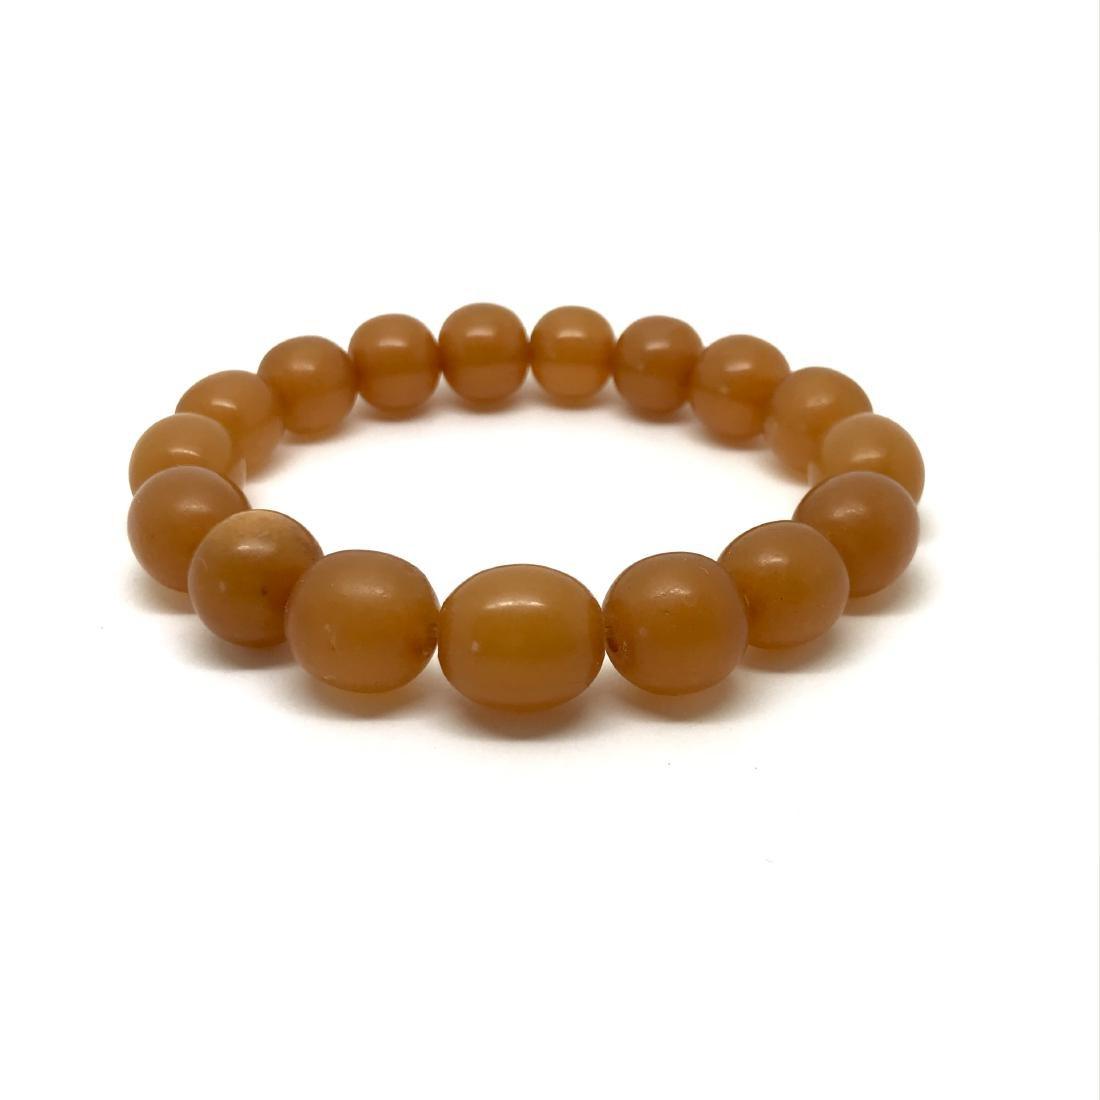 Vintage bracelet Baltic amber butterscotch beads